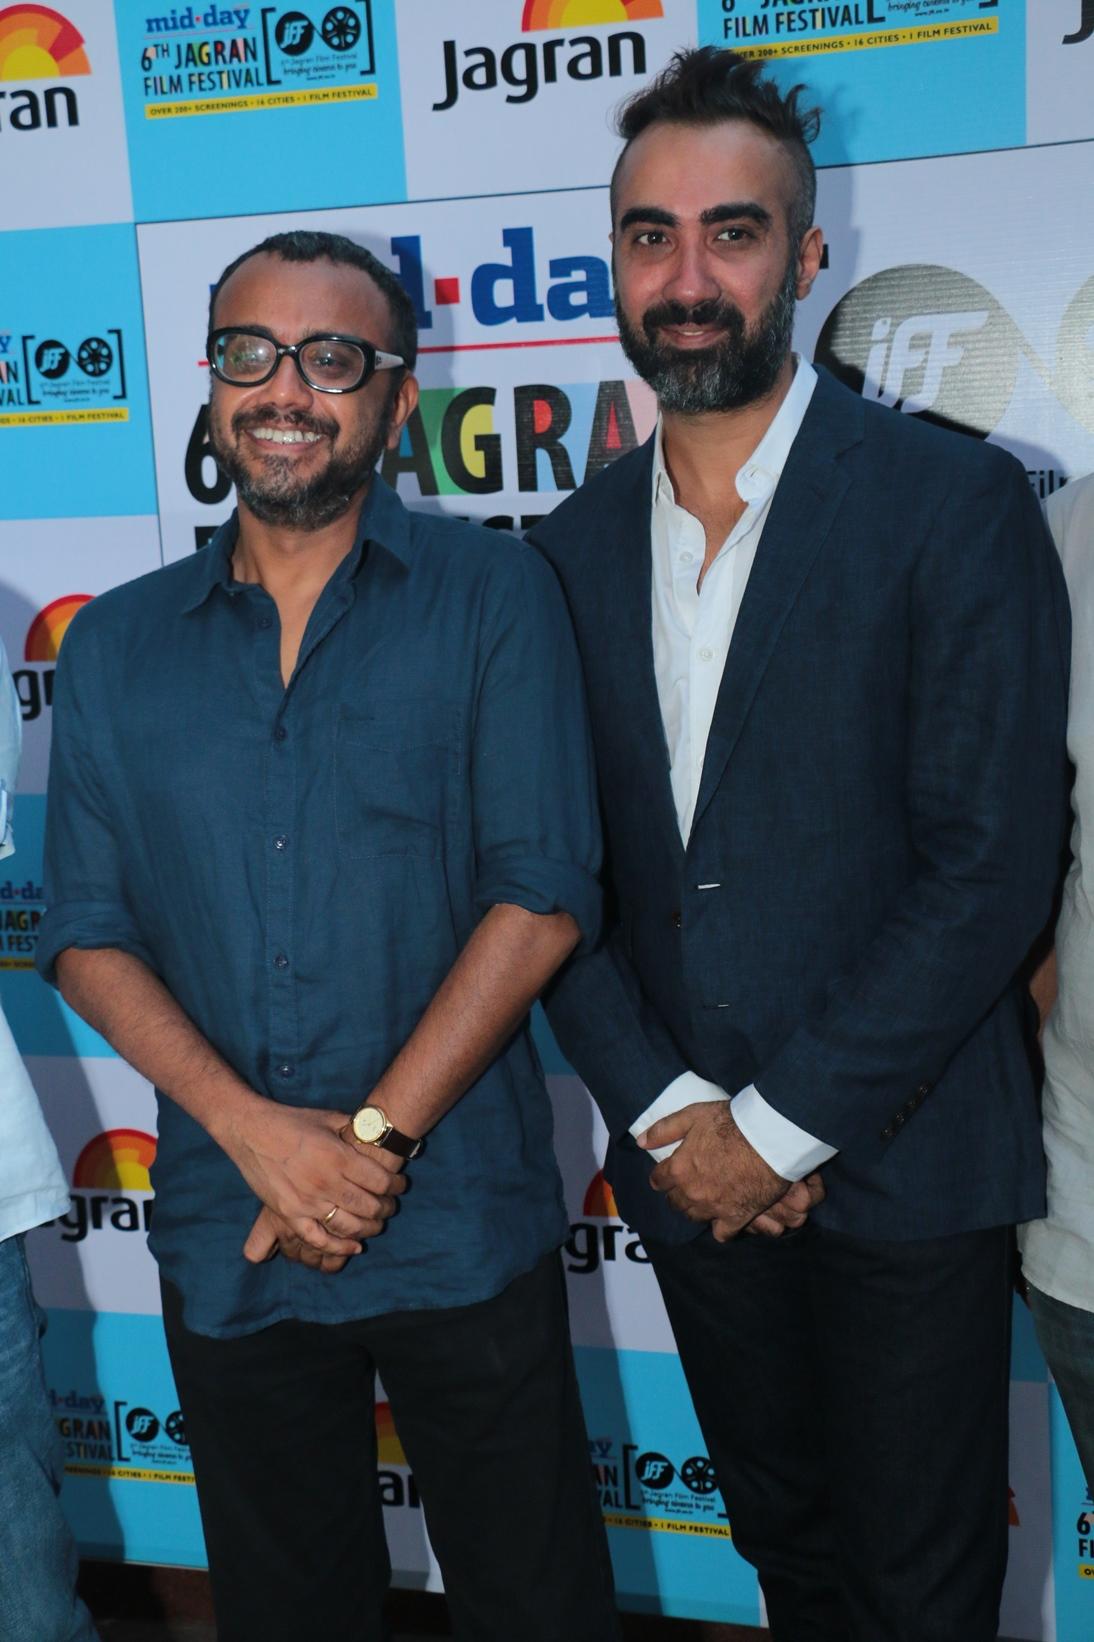 Dibakar Banerjee and Ranveer Shorey at the Opening Ceremony of the 6th Jagran Film Festival 2015